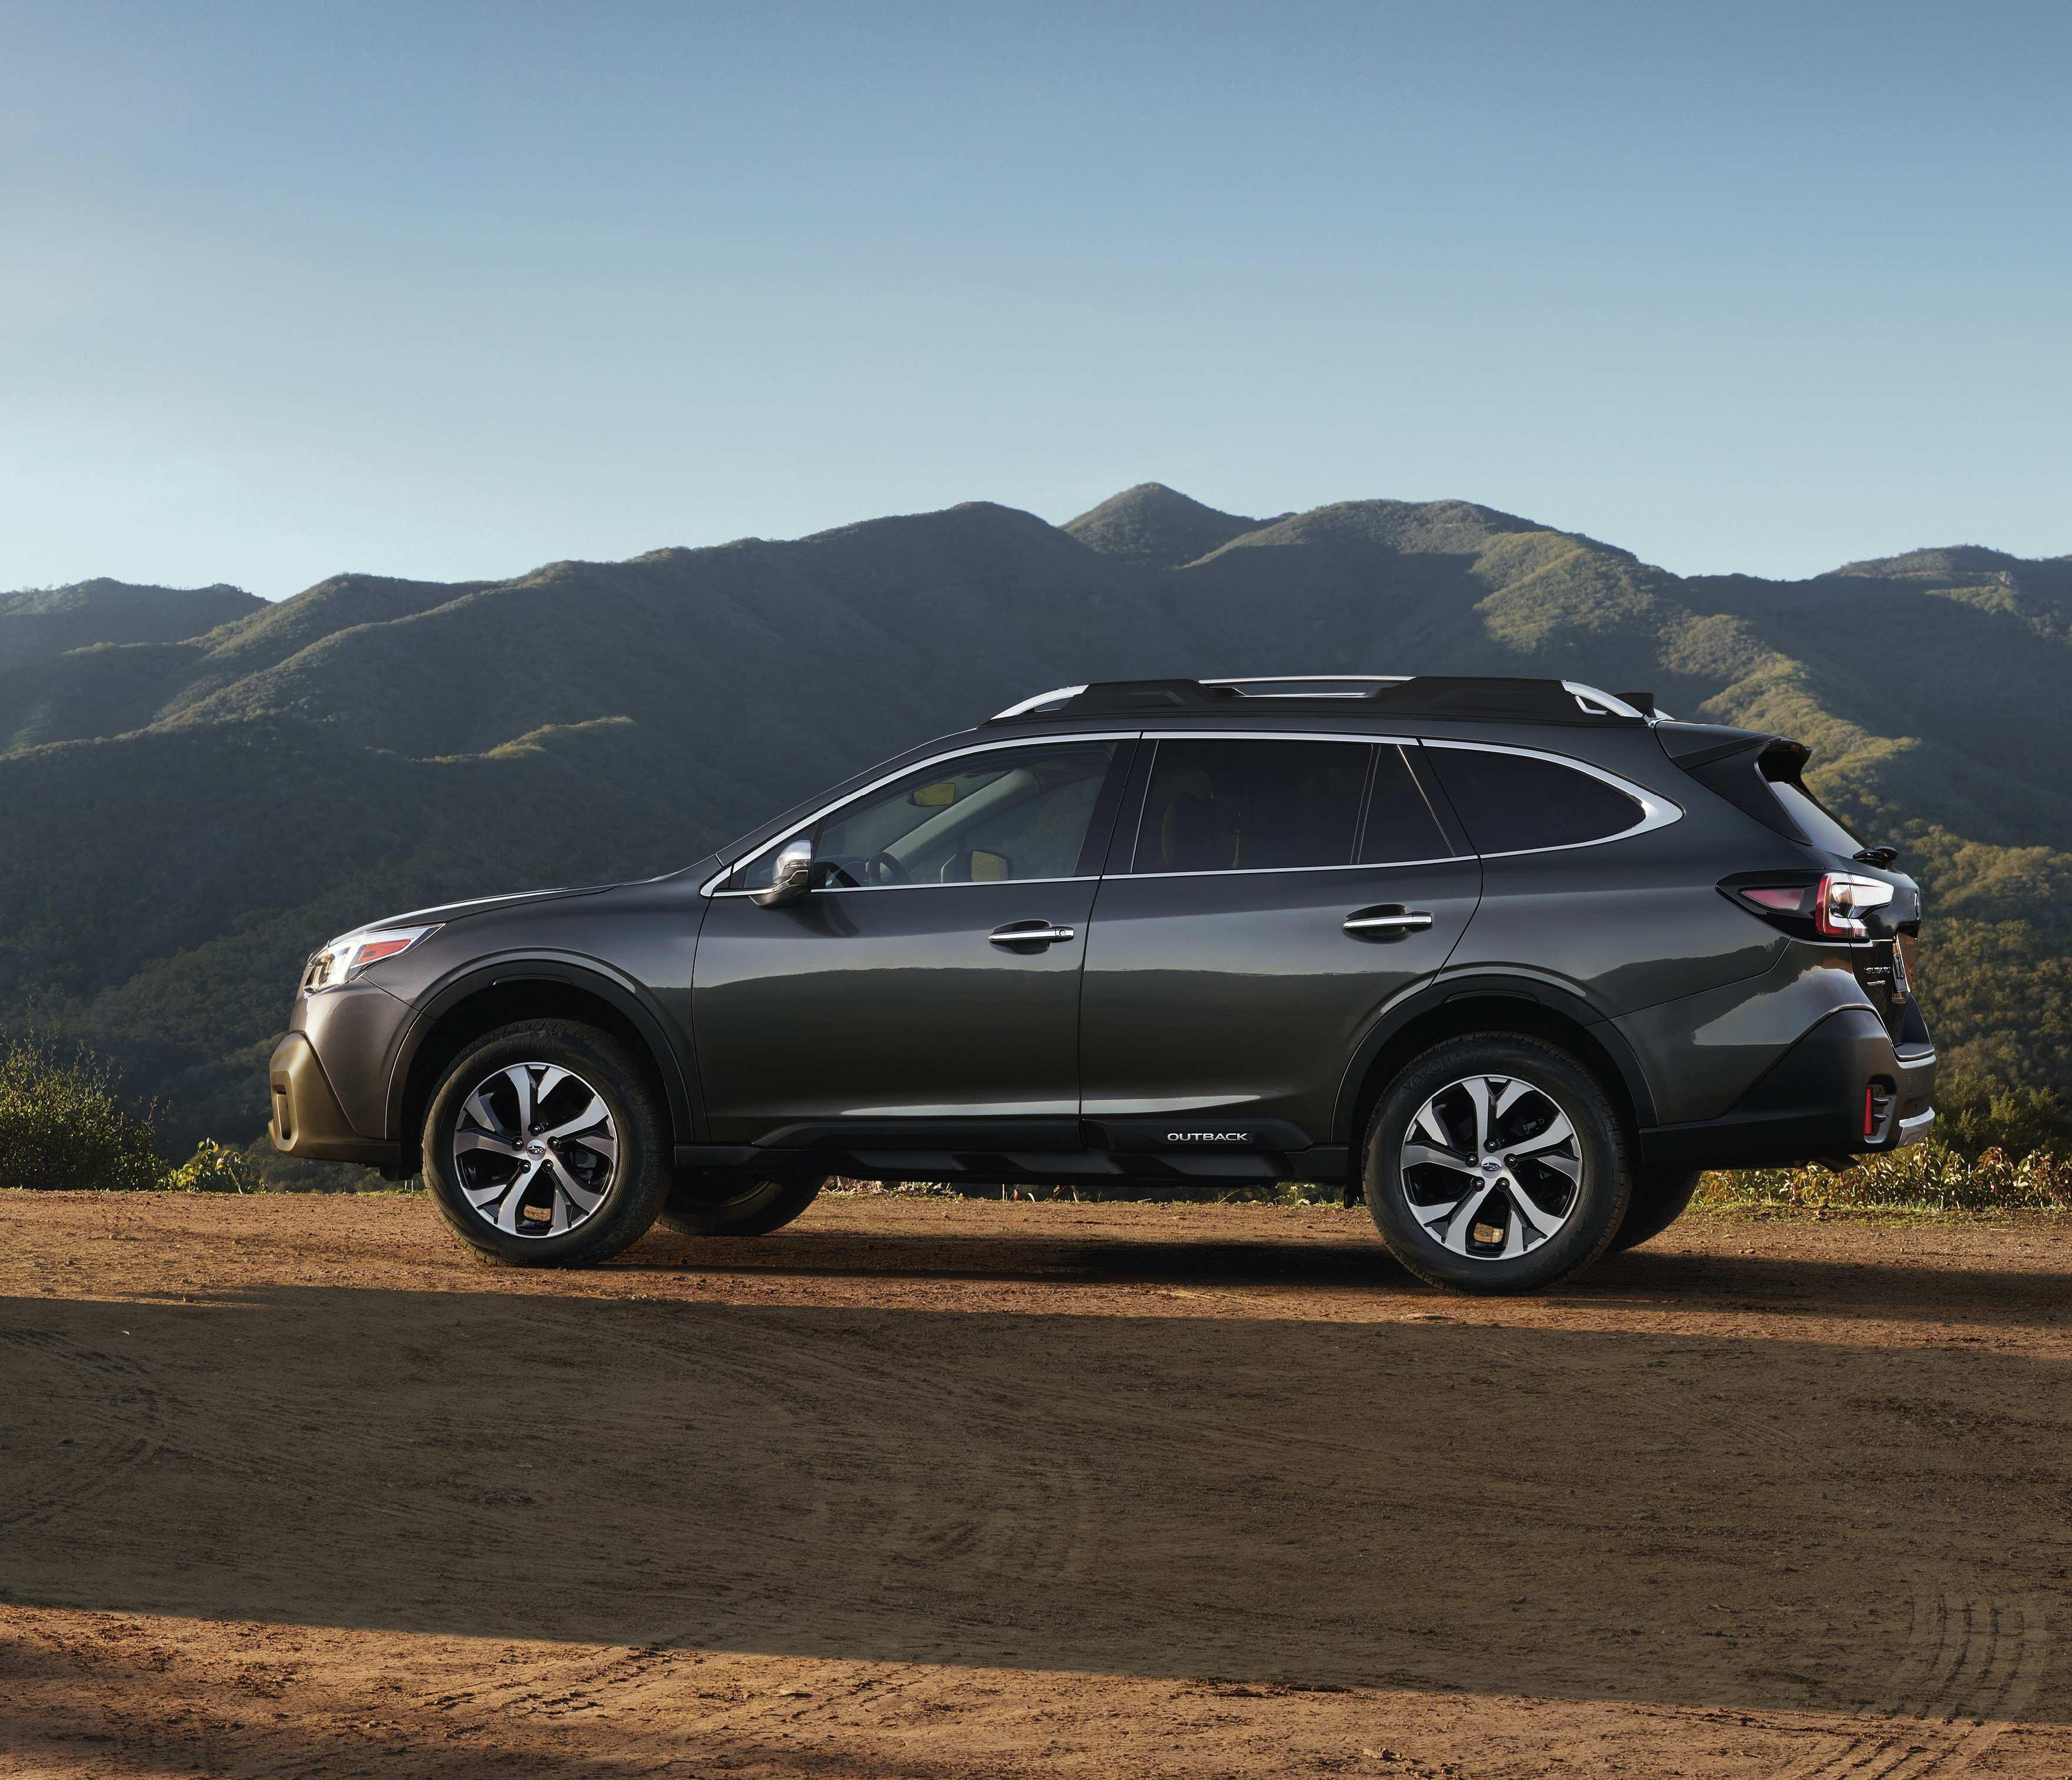 60 All New Subaru Outback 2020 Japan Exterior by Subaru Outback 2020 Japan